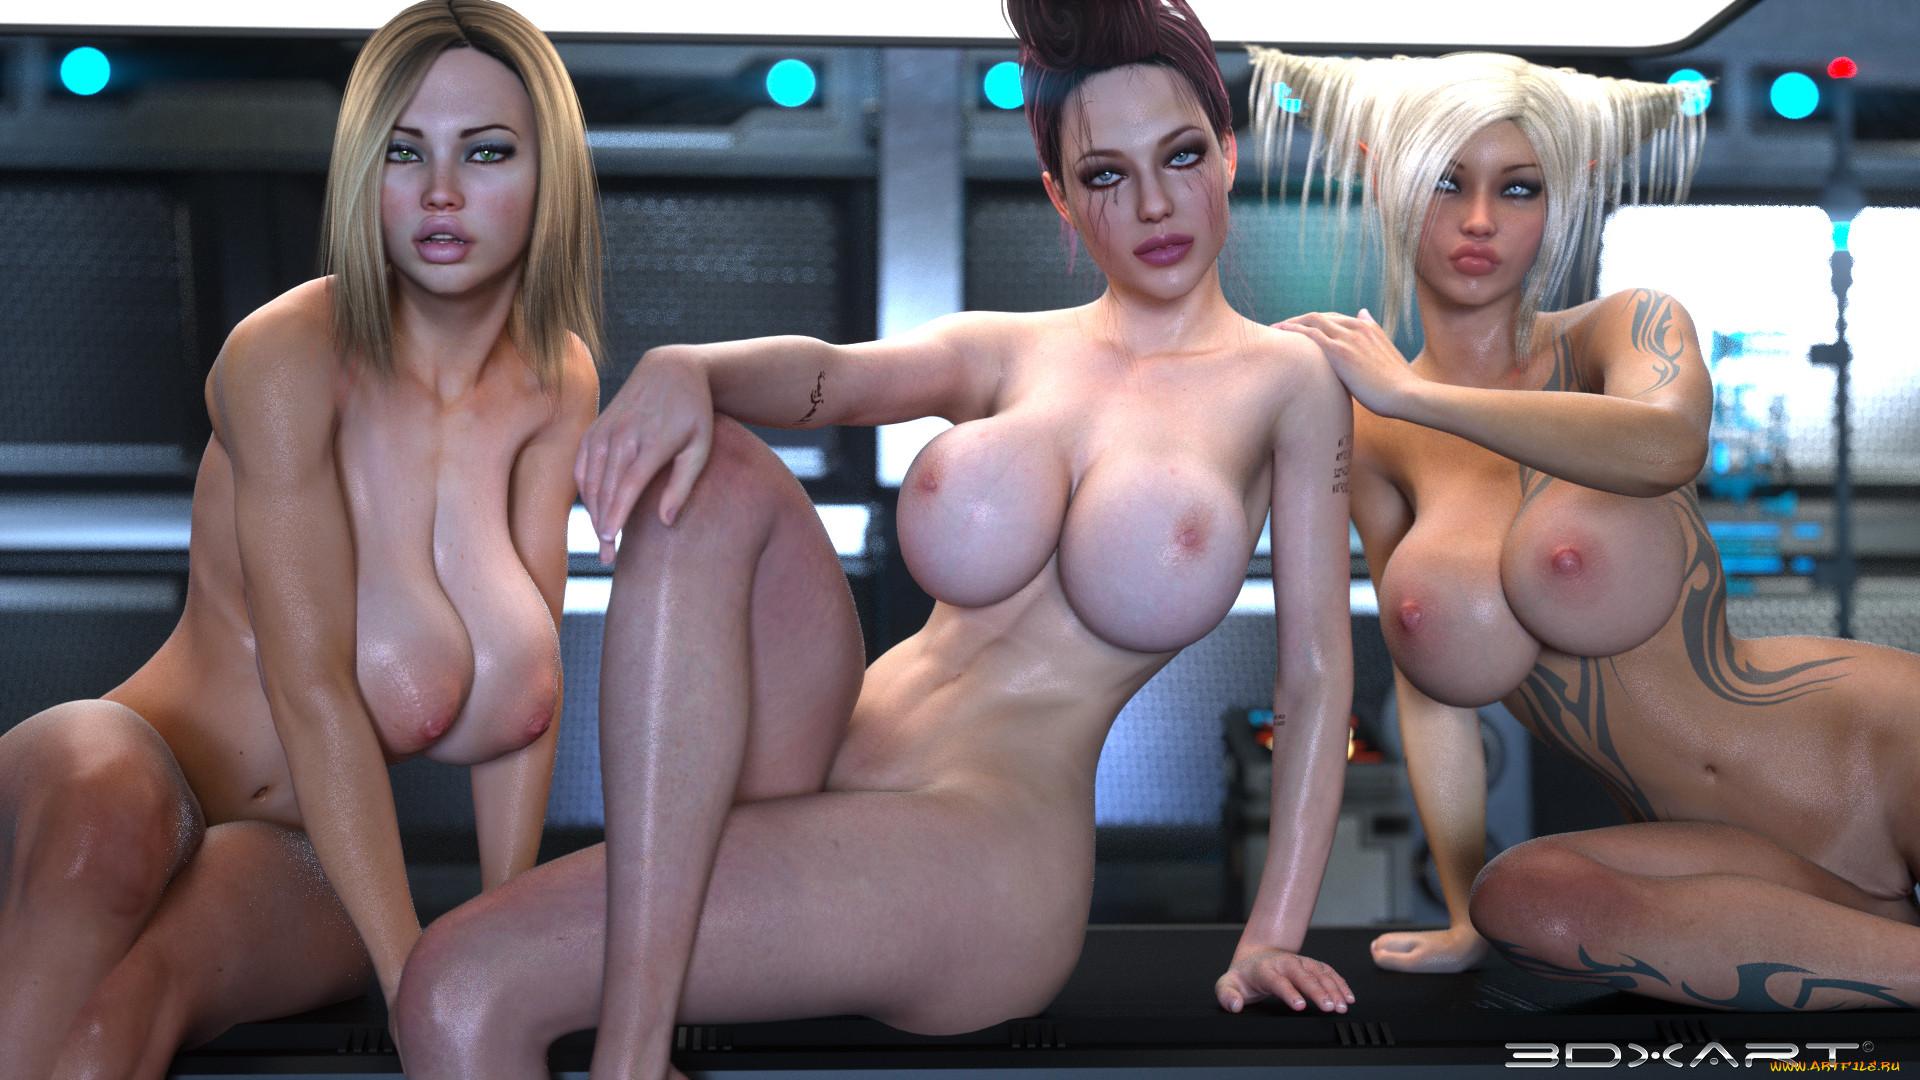 virtual-interactive-porn-babes-upskirt